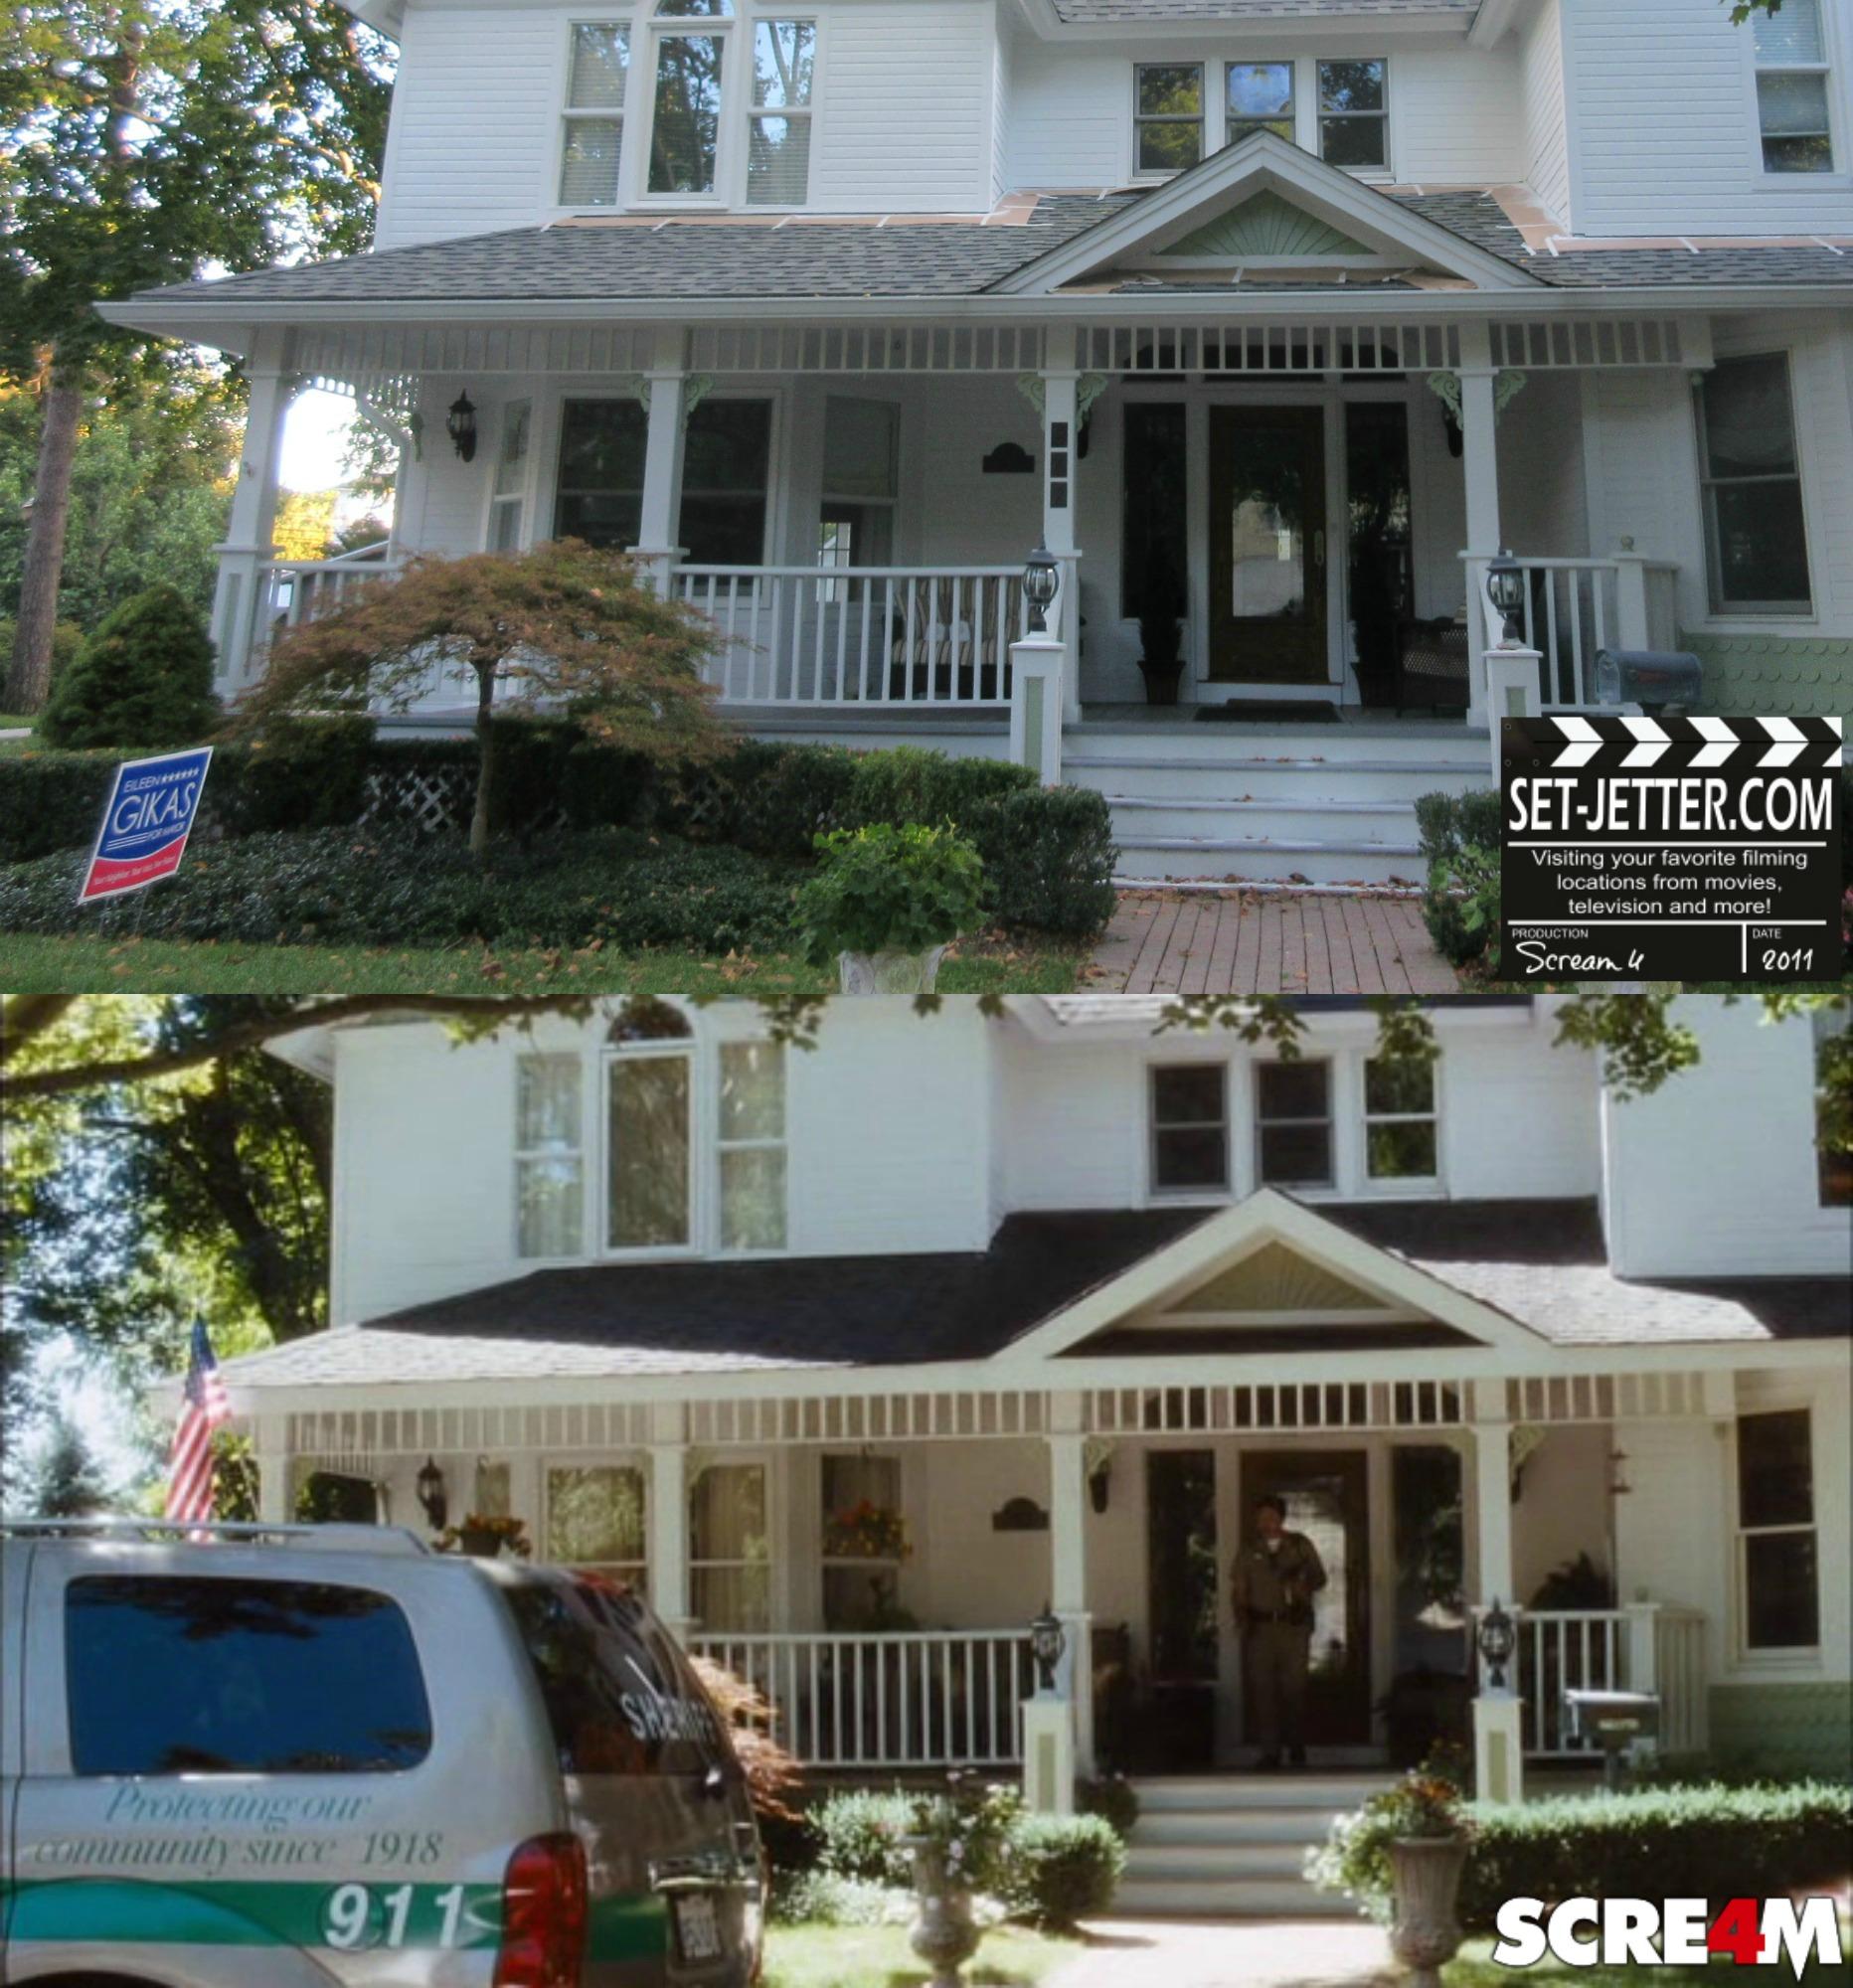 Scream4 comparison 22.jpg